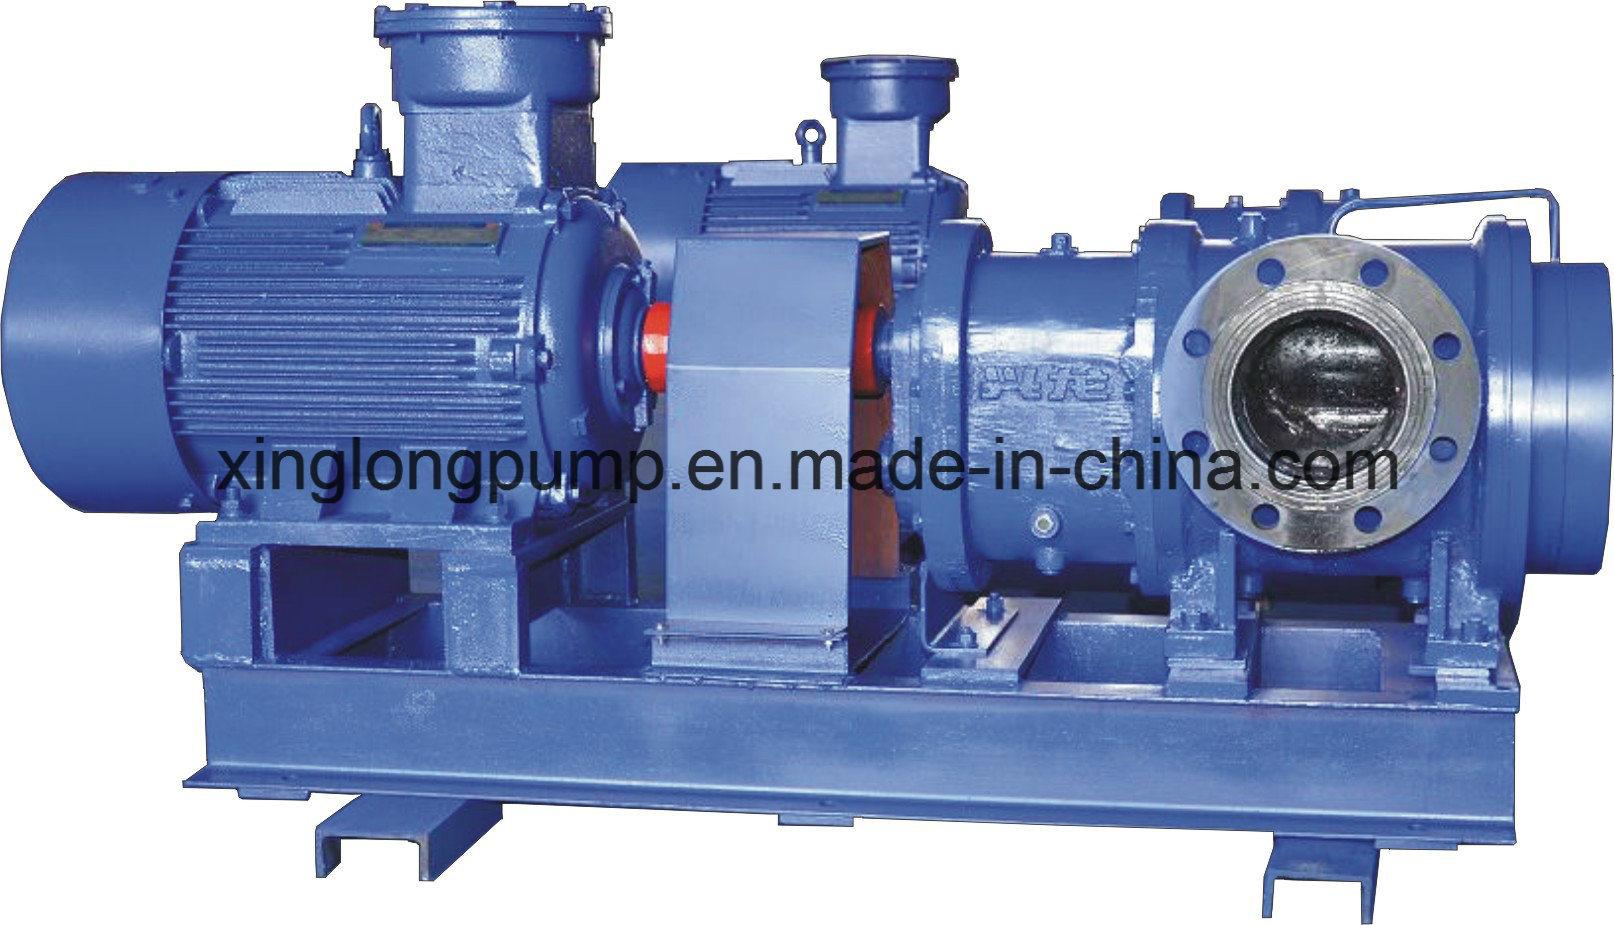 Xs Serial Twin Screw Pump